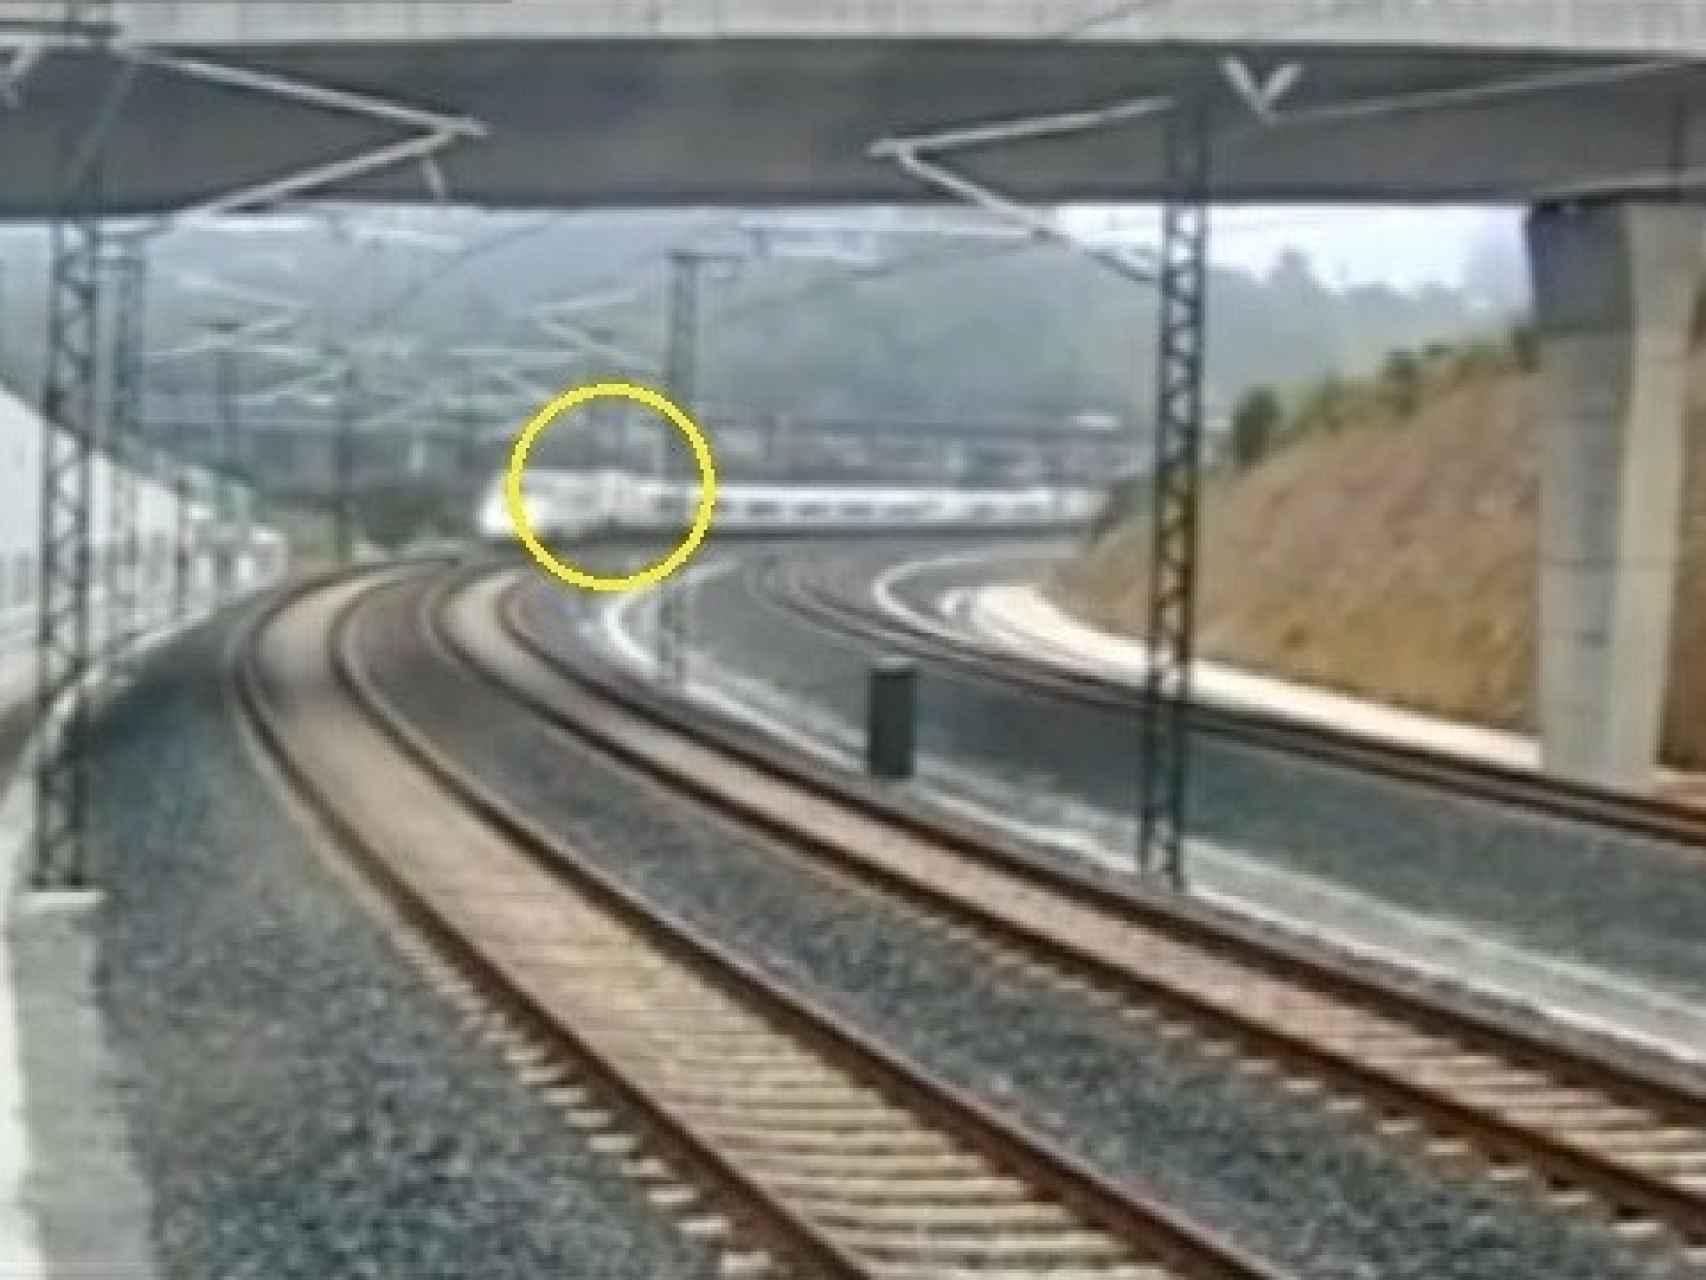 Captura 11 del vídeo del accidente del tren Alvia 730